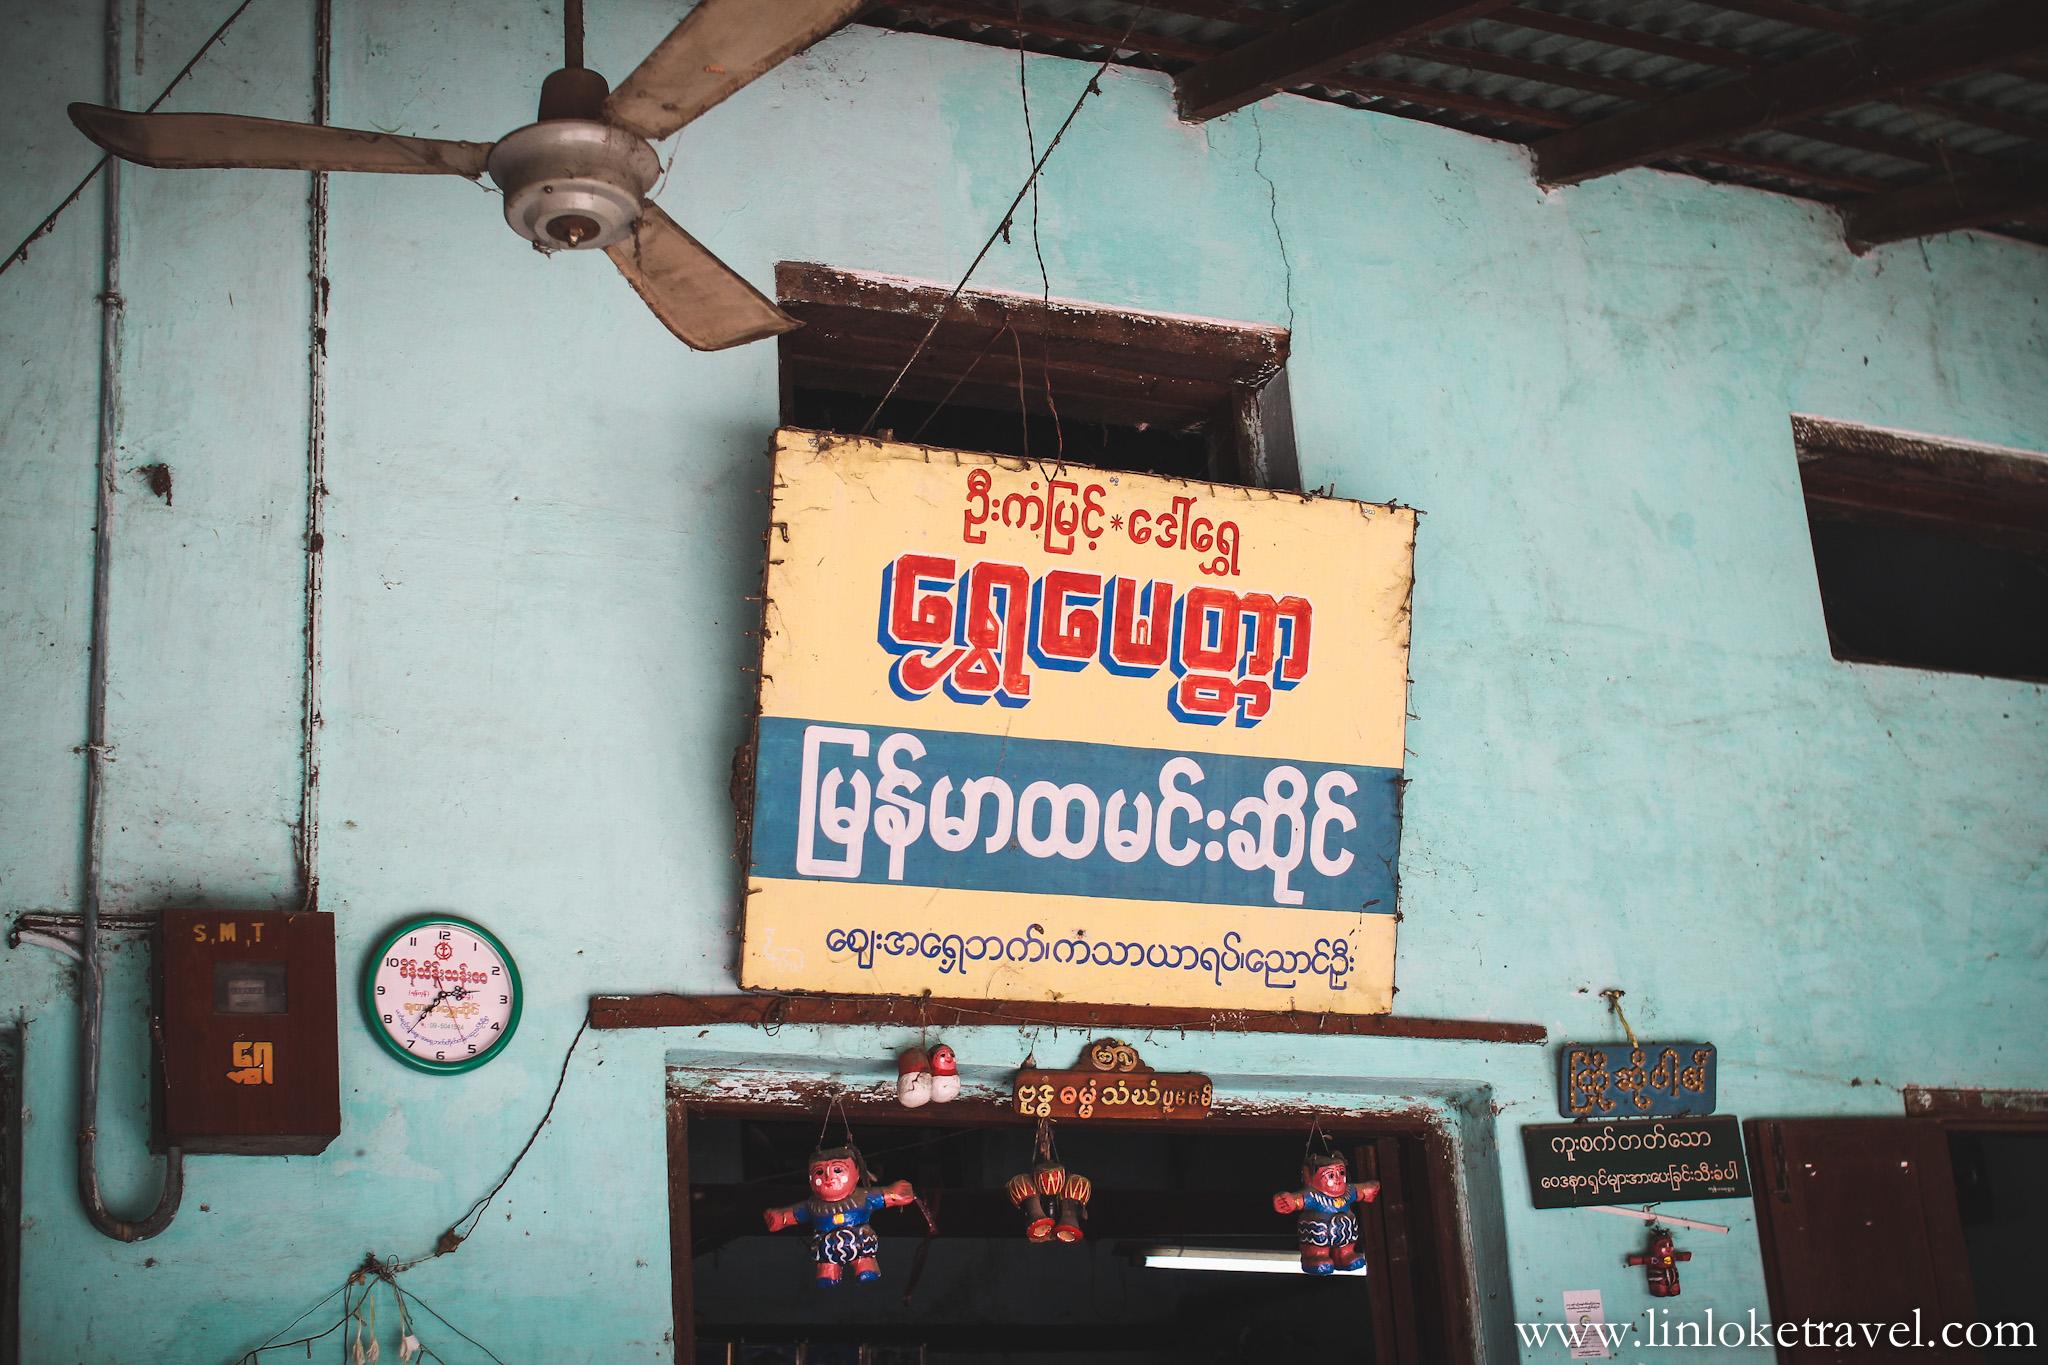 Traditional Burmese cafe-restaurant signage